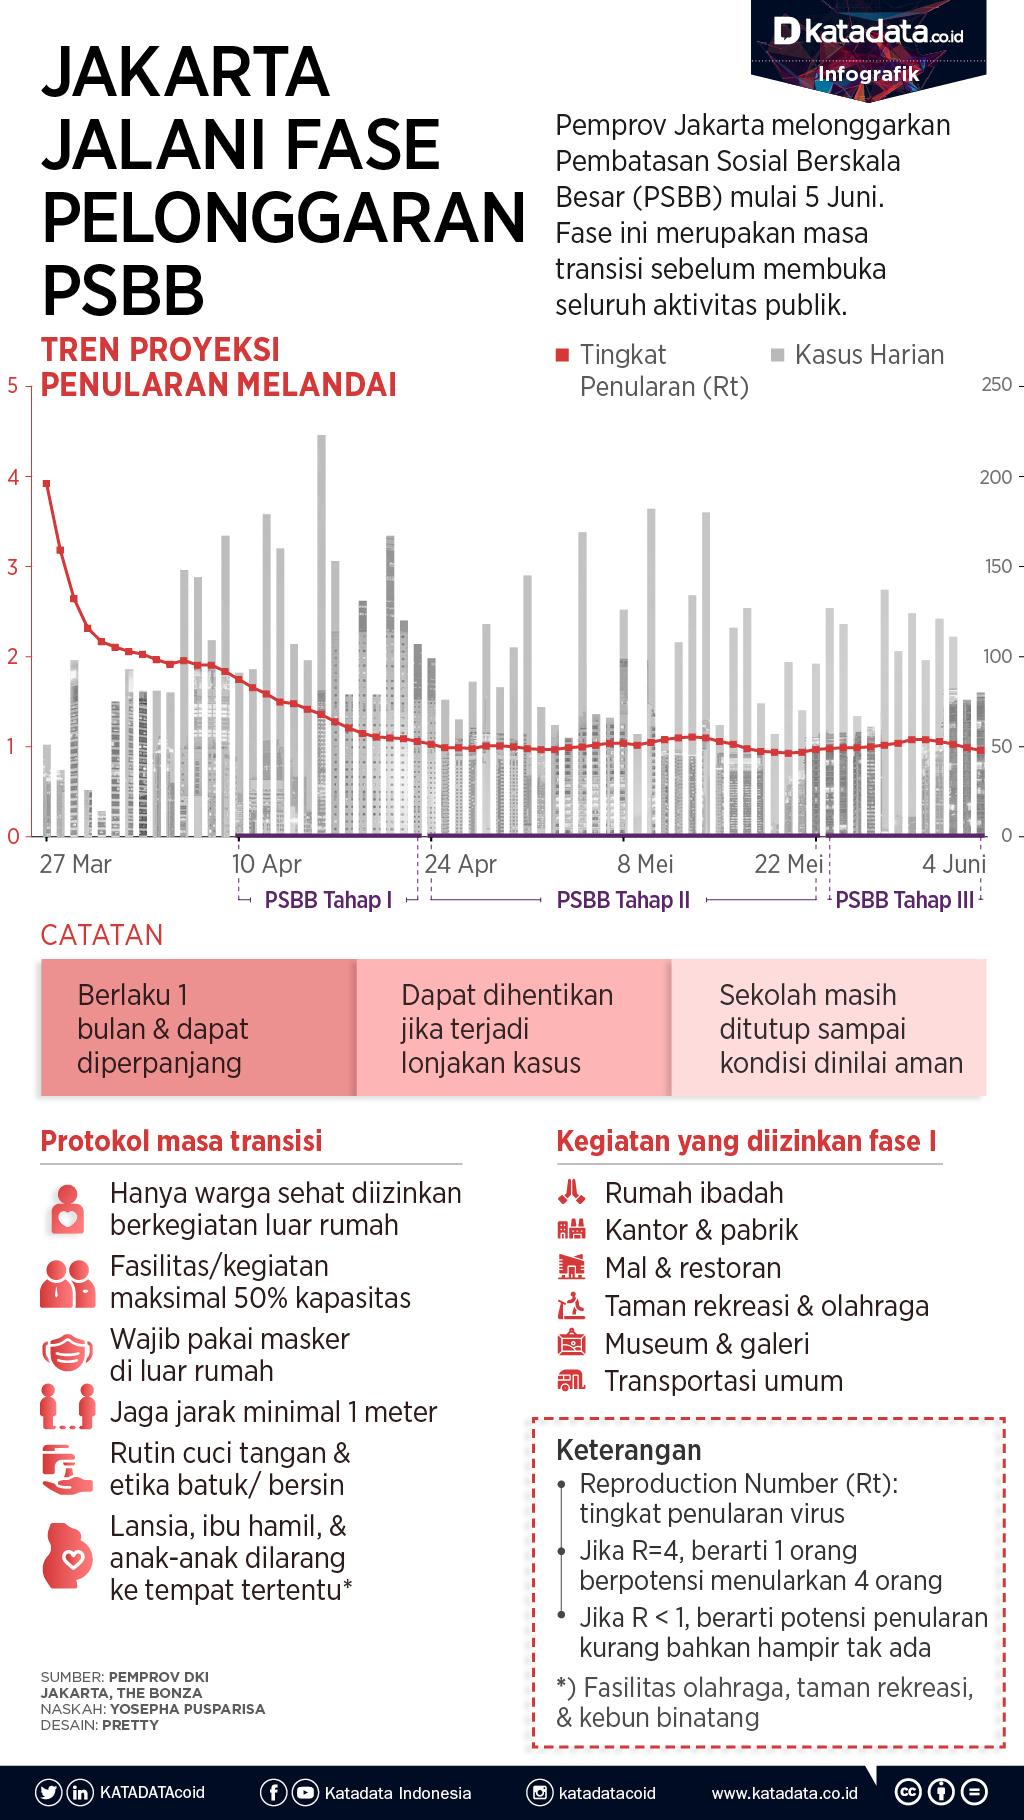 Jakarta Jalani Fase Pelonggaran Psbb Infografik Katadata Co Id